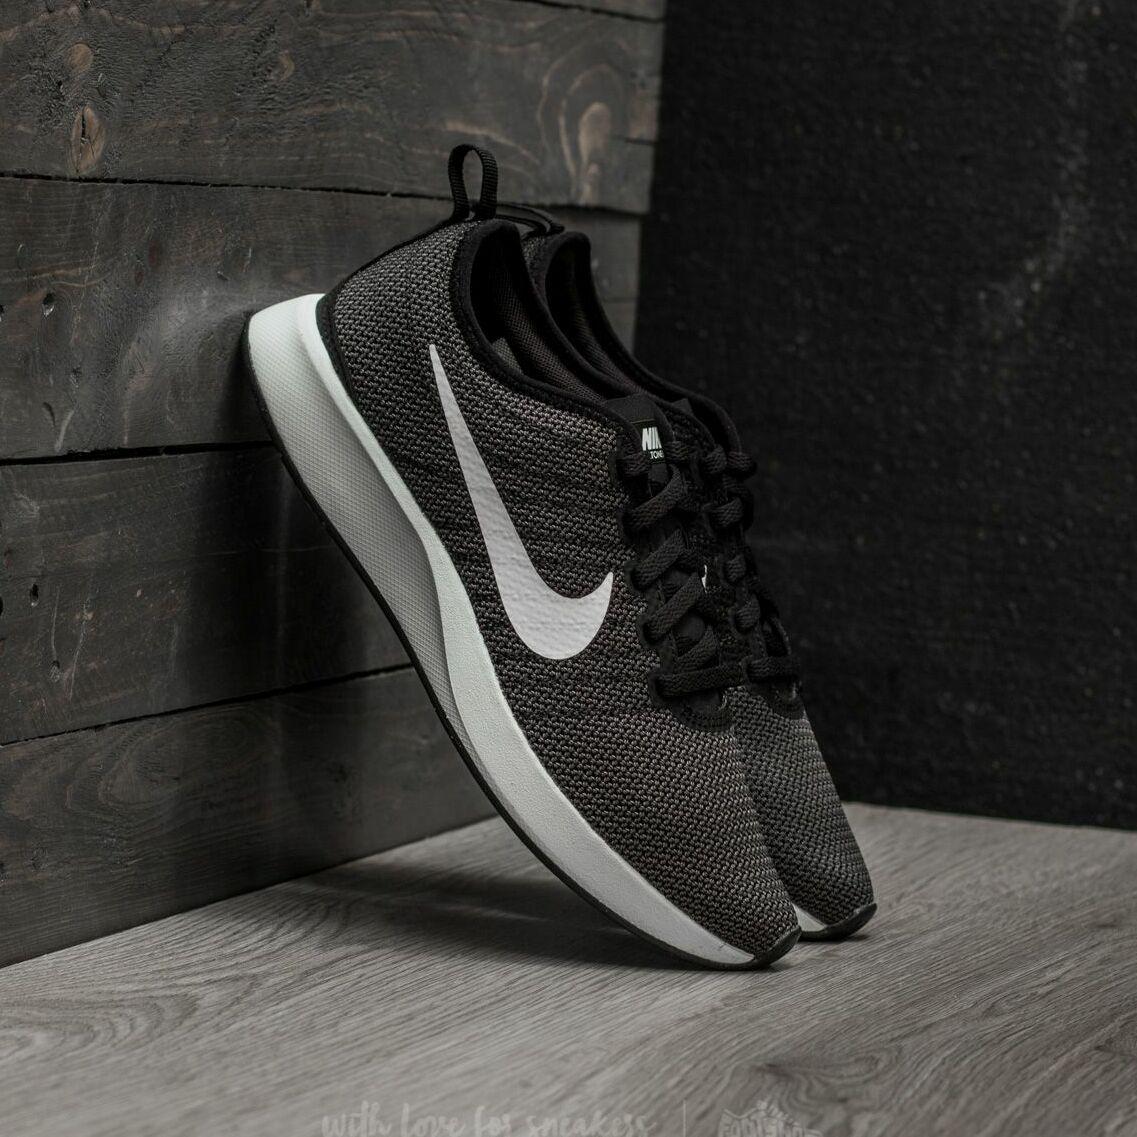 Nike Wmns Dualtone Racer Black/ White-Dark Grey EUR 35.5